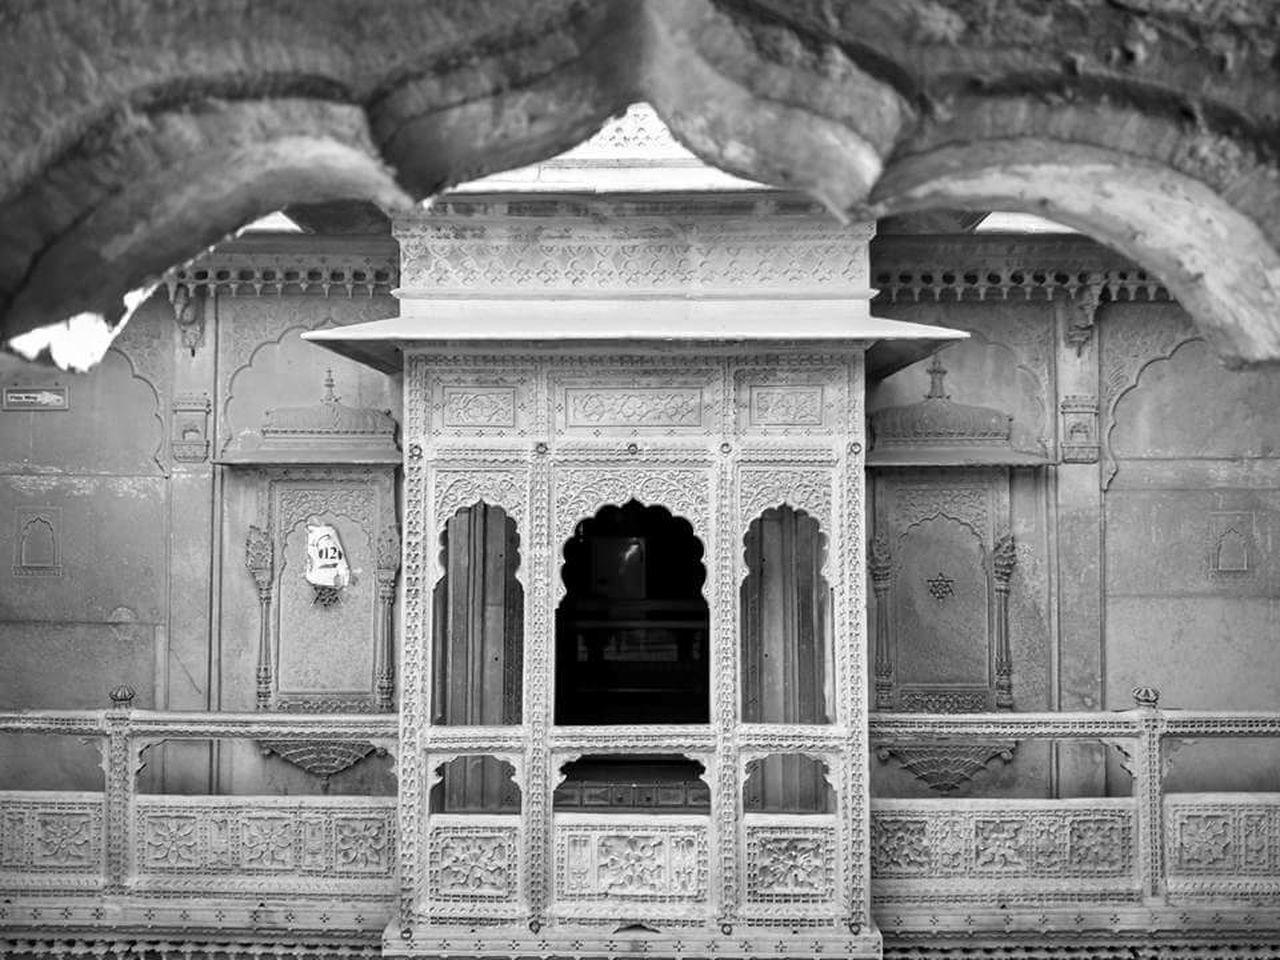 Rawimage Haveli Architecture Storybehindthisbeauty Indian History -soi Patwa Haweli Rajasthan_diaries